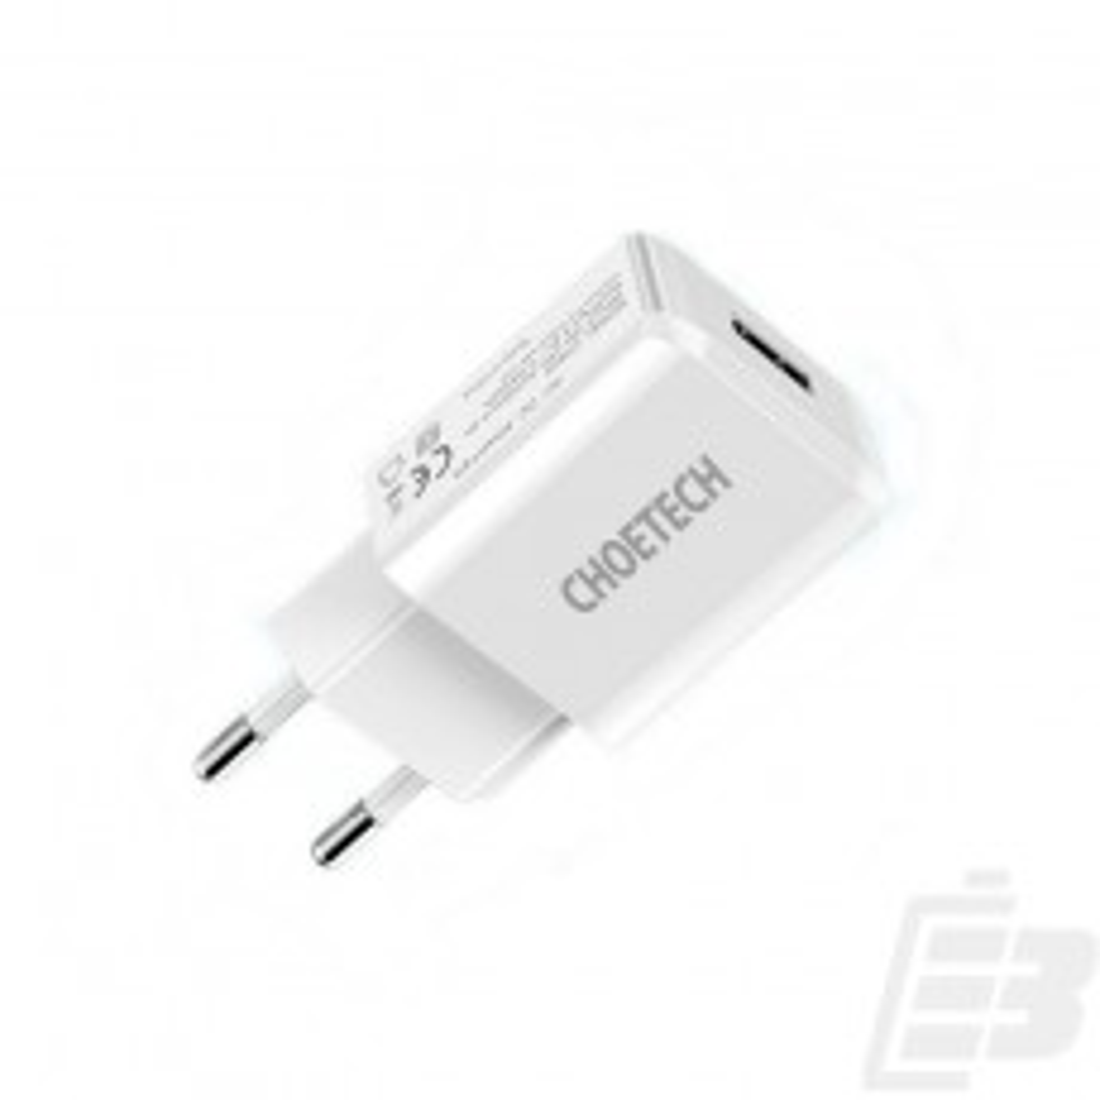 Choetech C0029 Wall Adapter 1 x USB